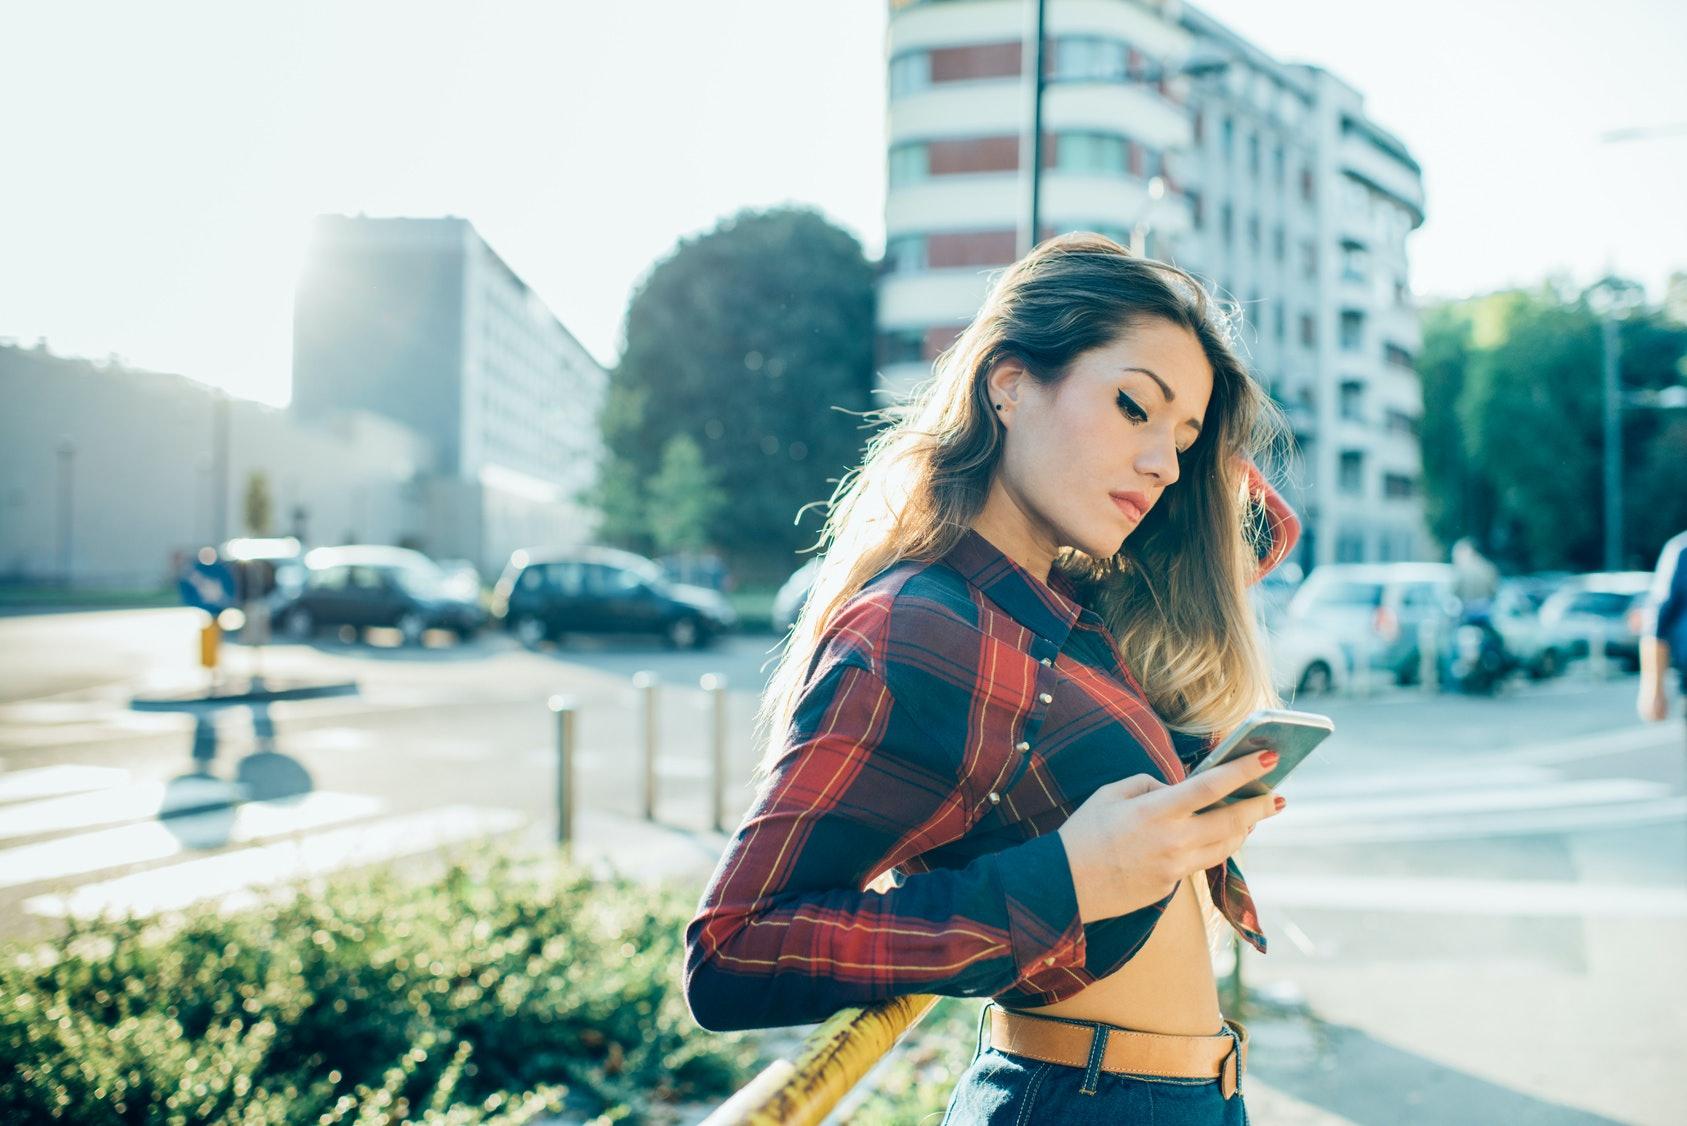 Curltv online dating